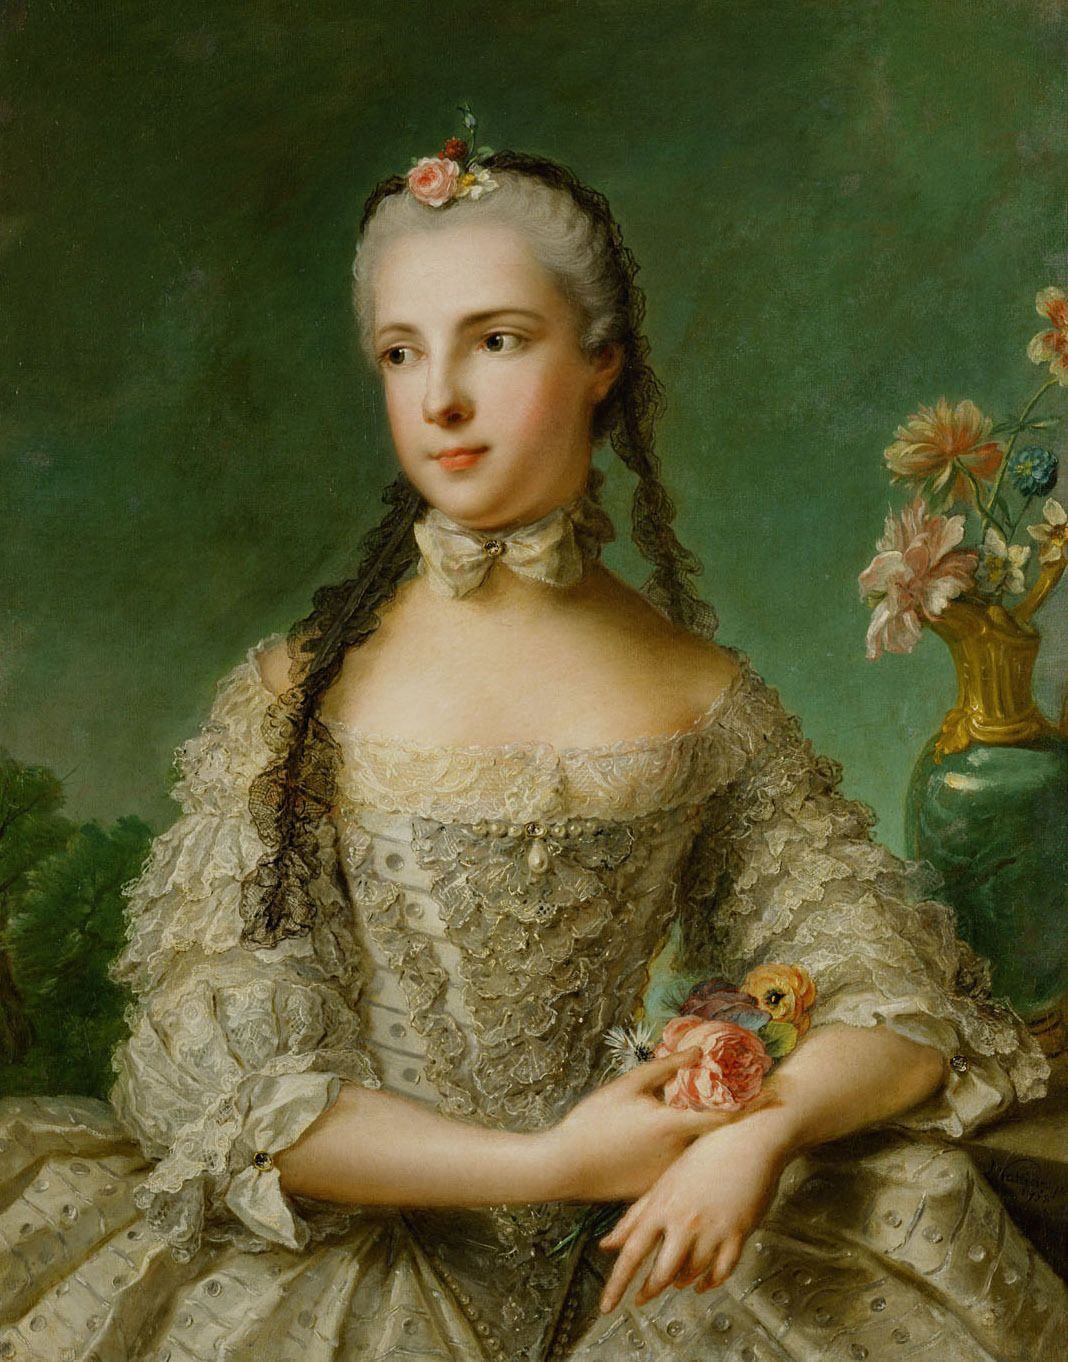 Sopranistin Teresa Bertinotti (1776-1854), datiert Triest, 29.